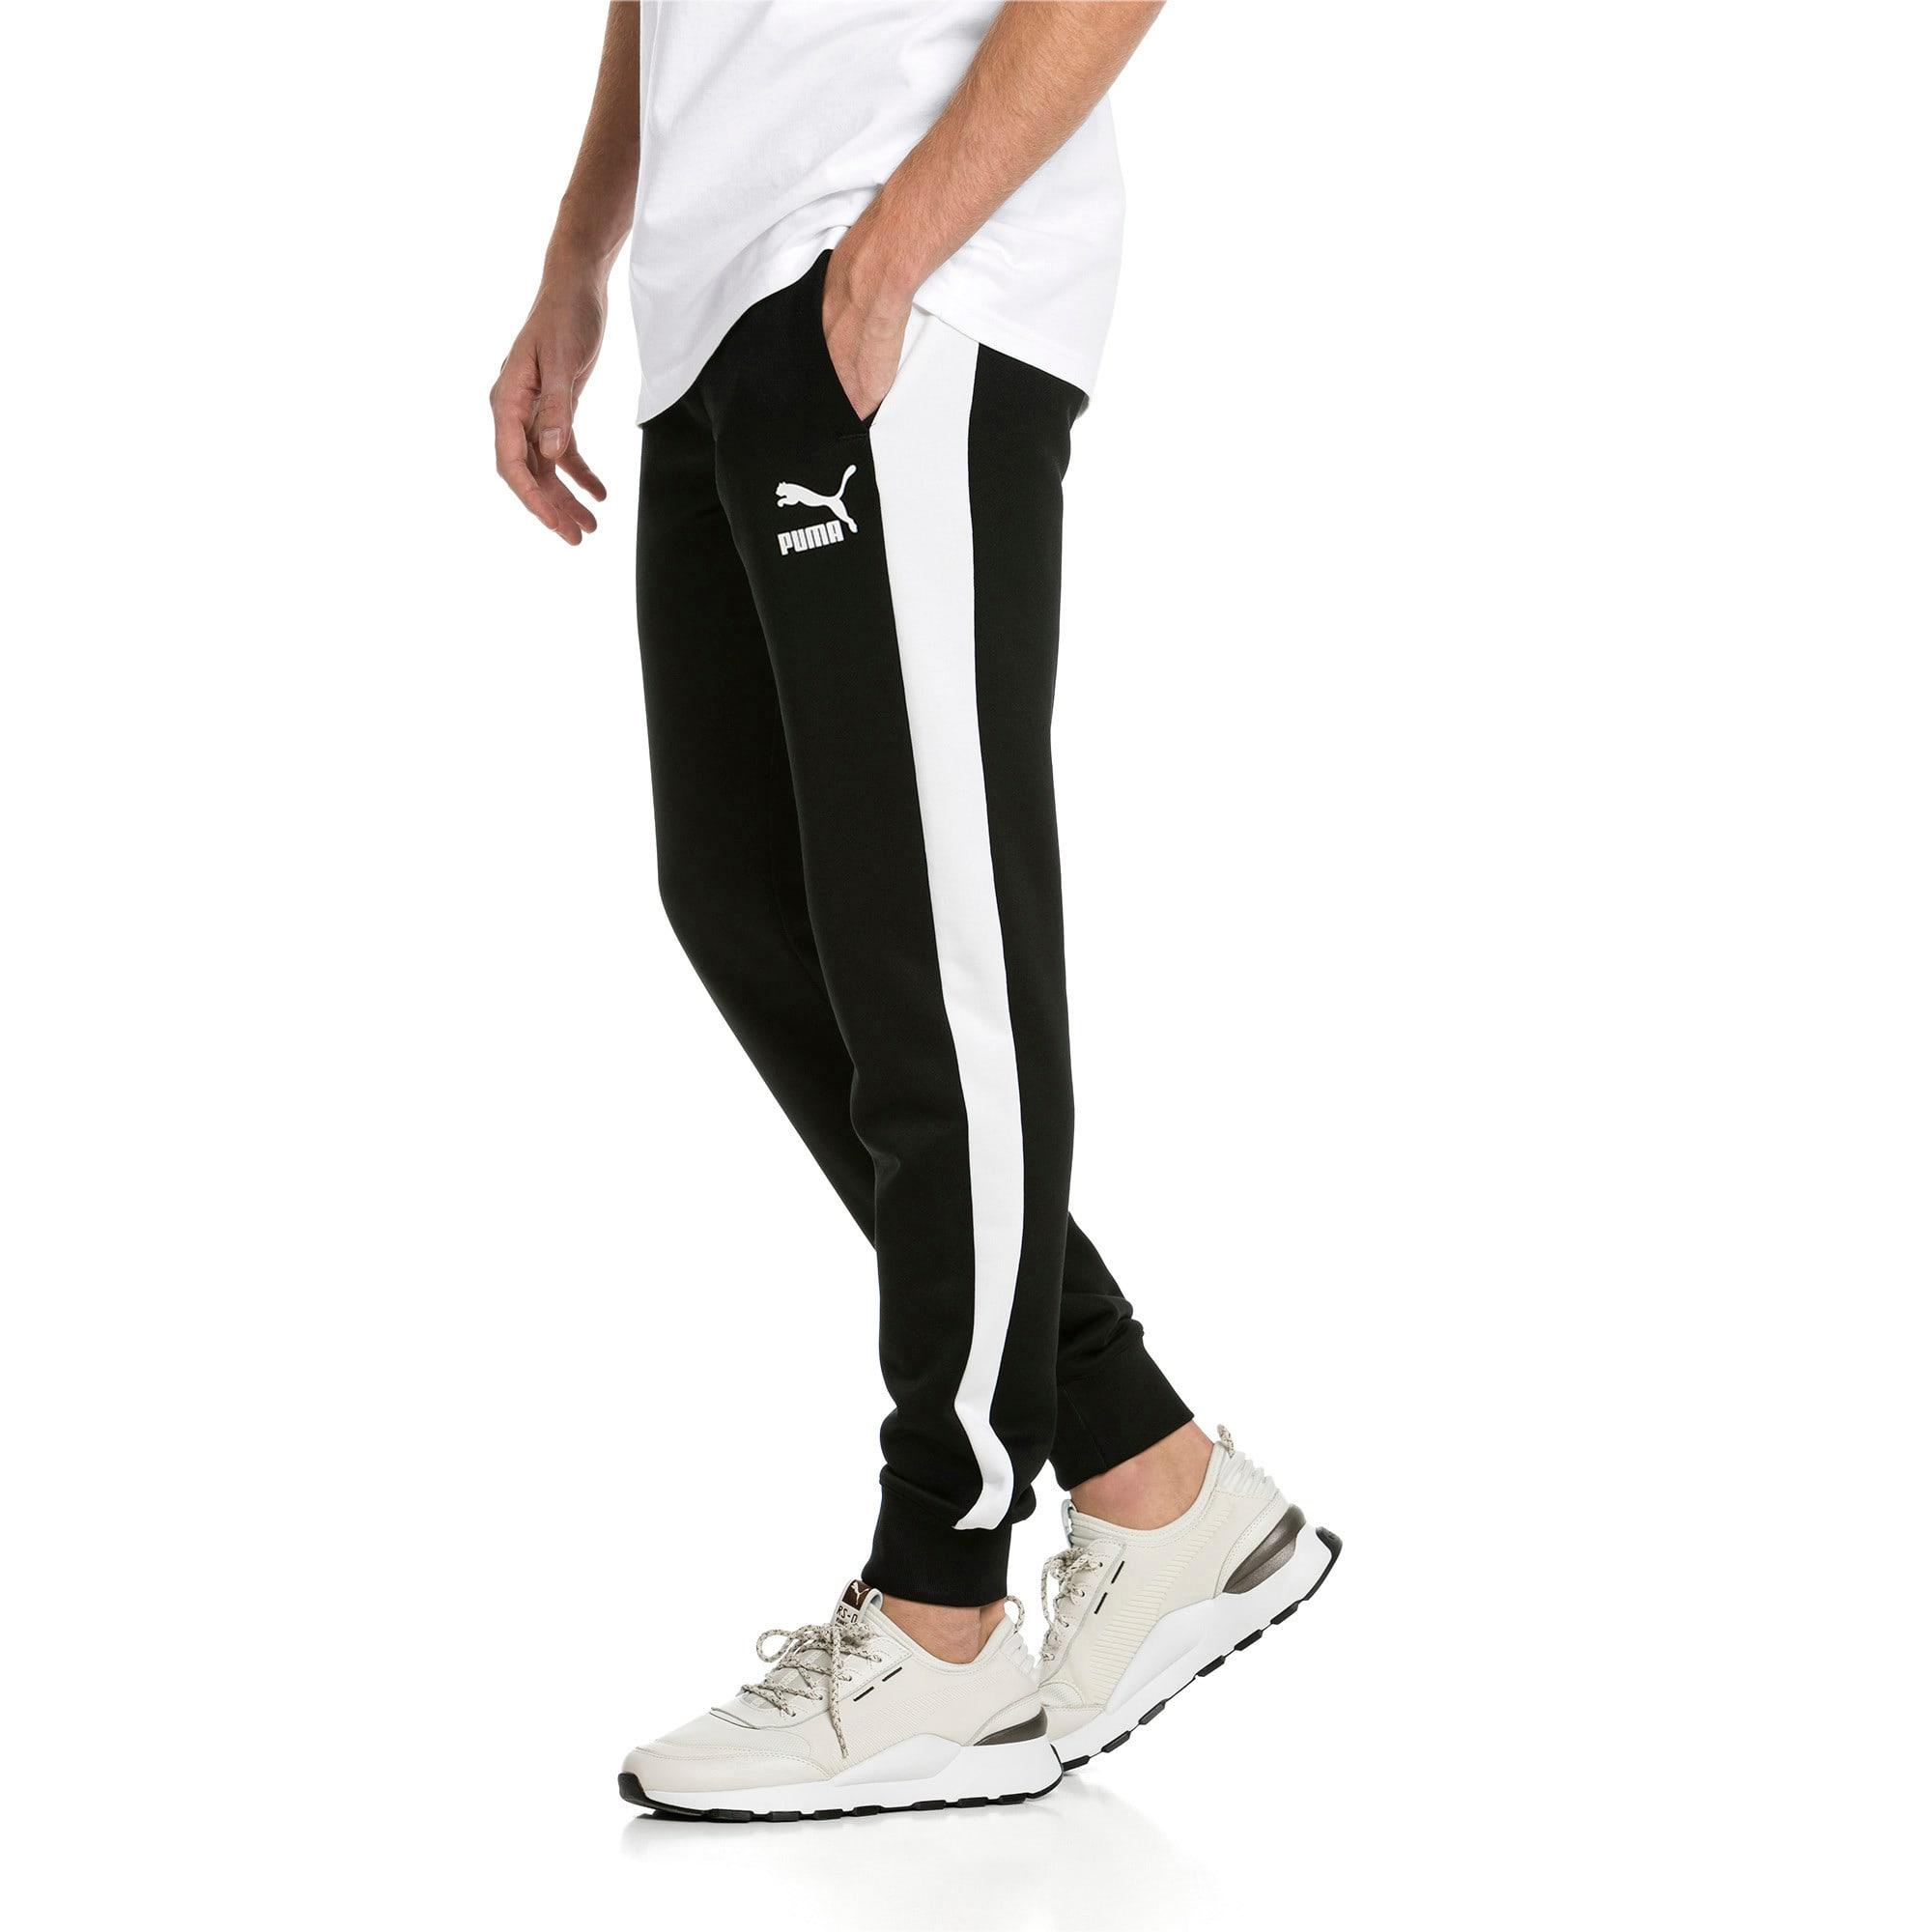 Thumbnail 1 of Iconic T7 Herren Gestrickte Sweatpants, Puma Black, medium